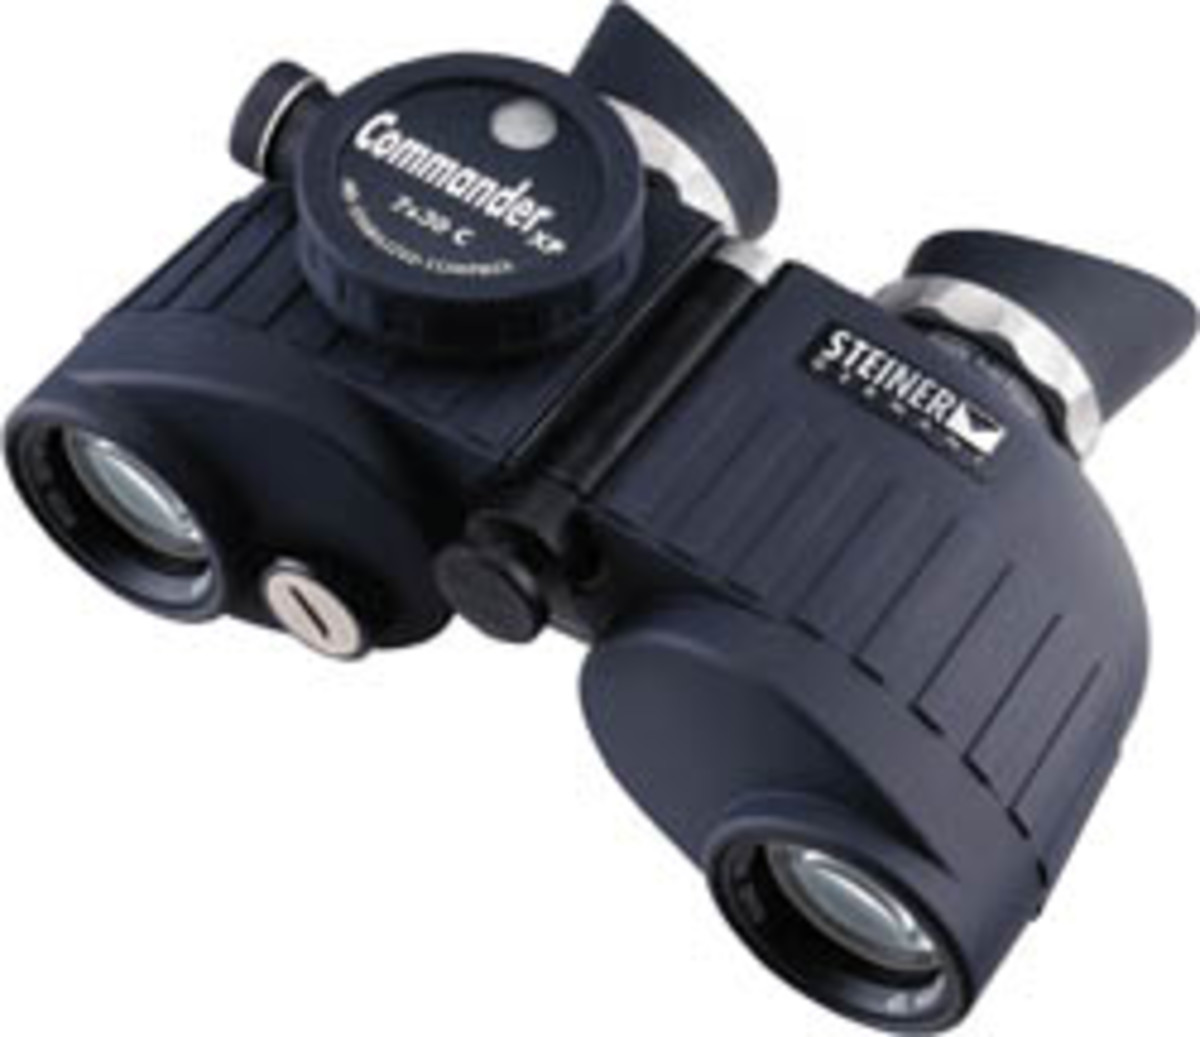 SteinerCommander XP binoculars